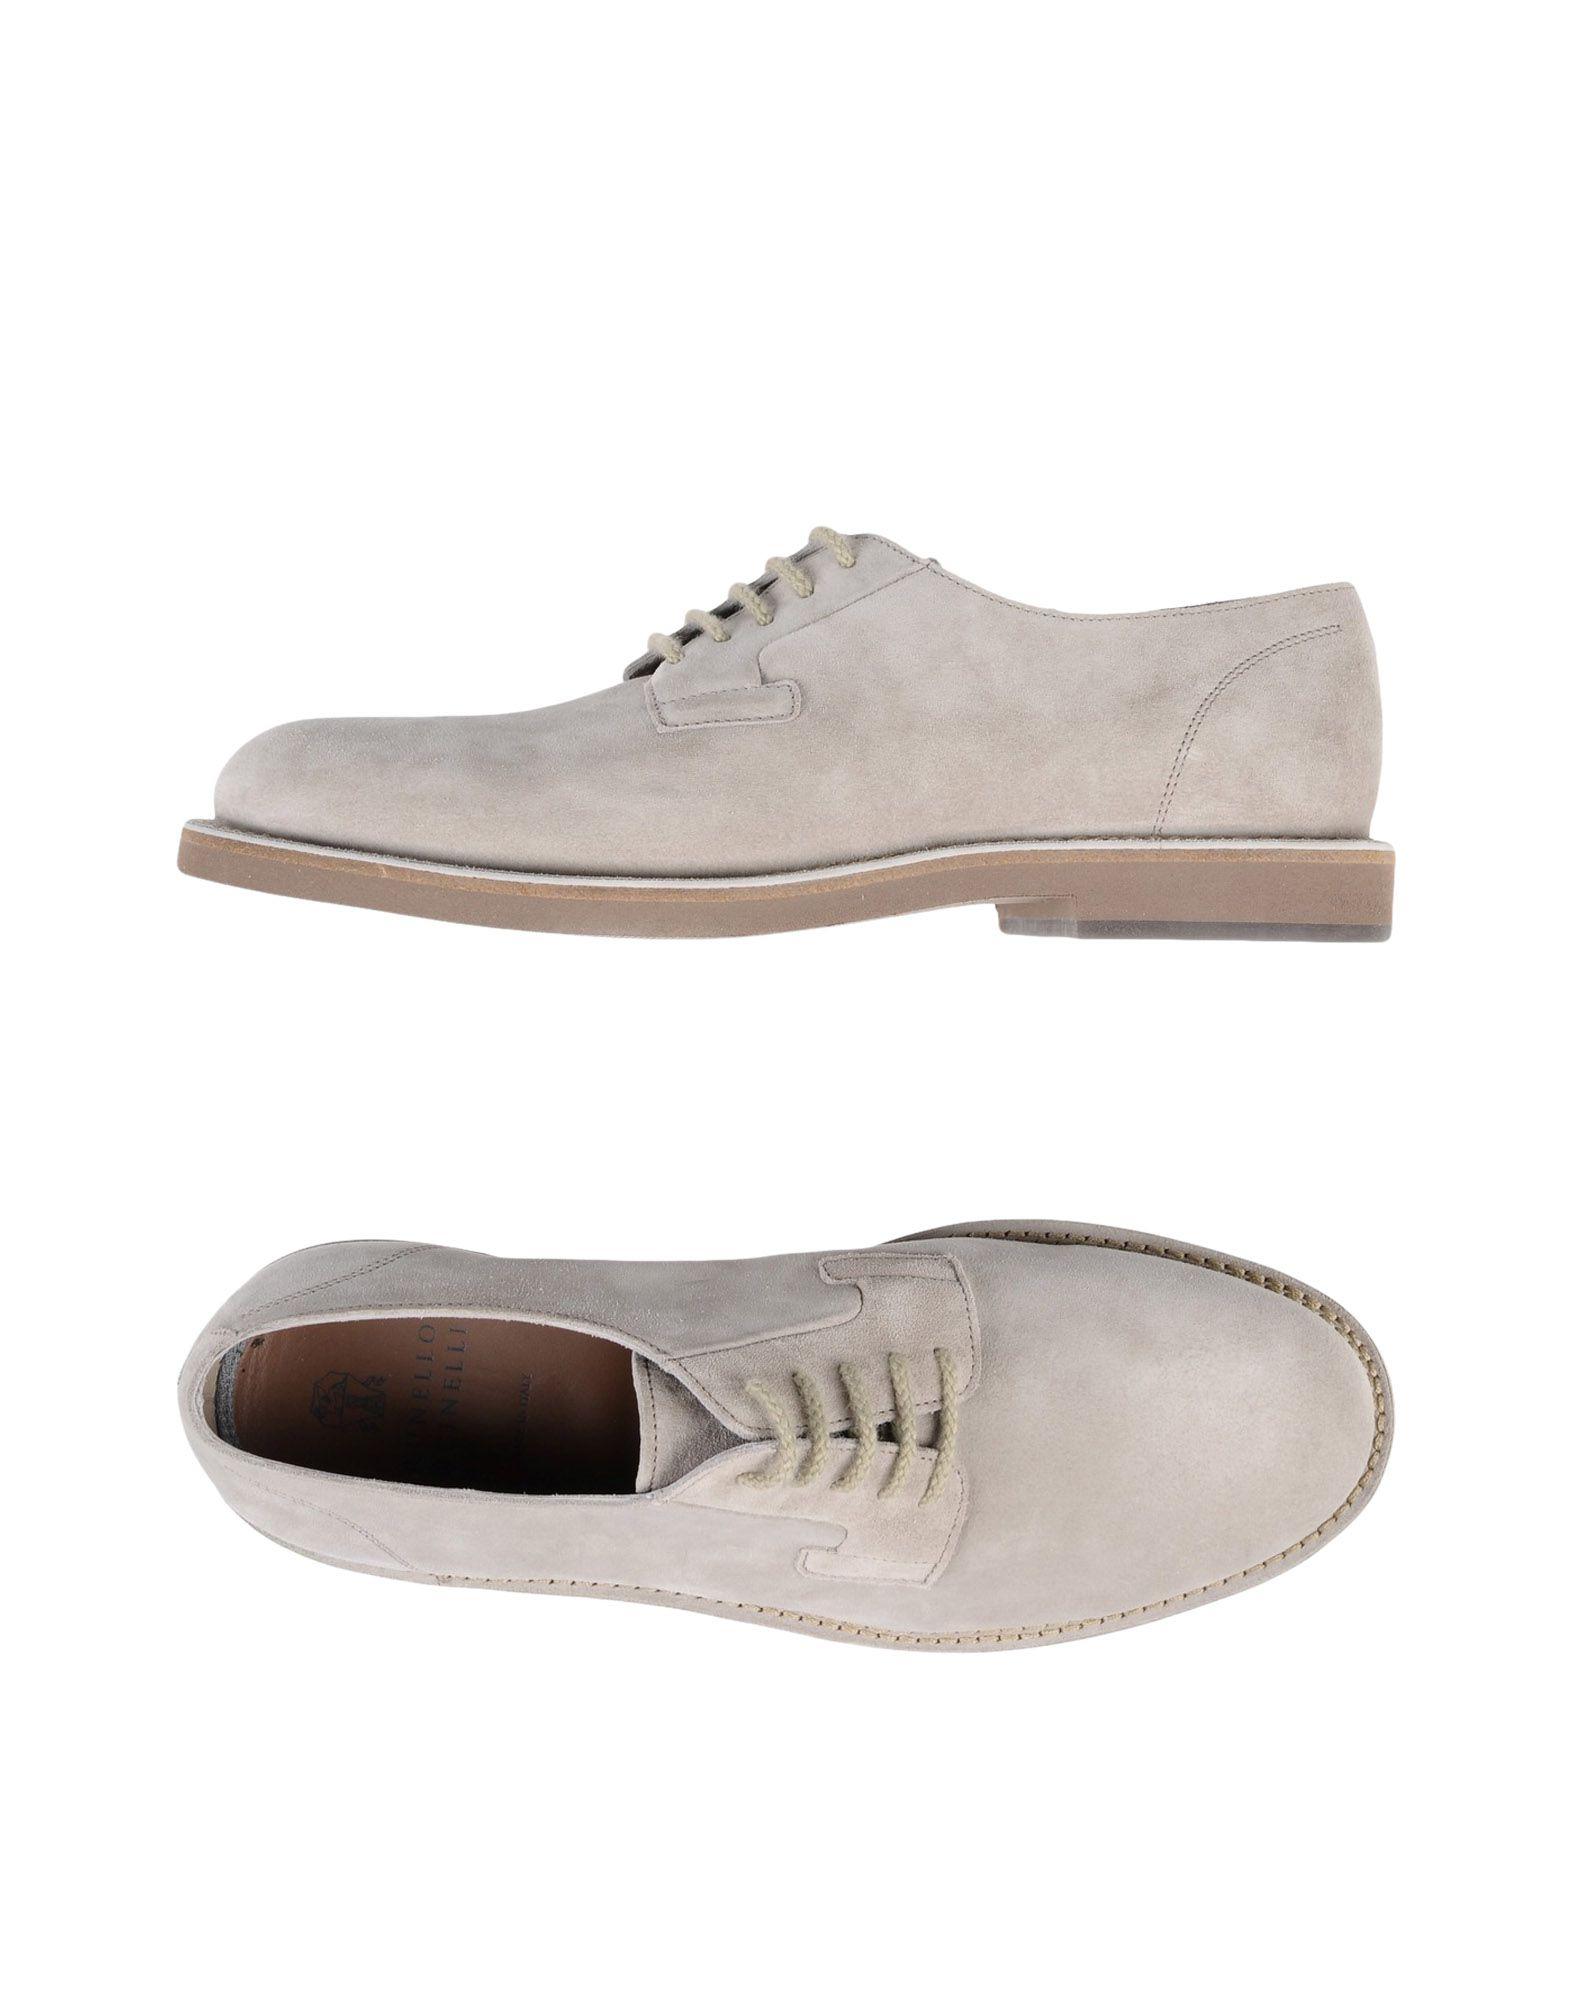 Brunello Cucinelli Schnürschuhe Herren  11397273GS Gute Qualität beliebte Schuhe Schuhe beliebte e81064